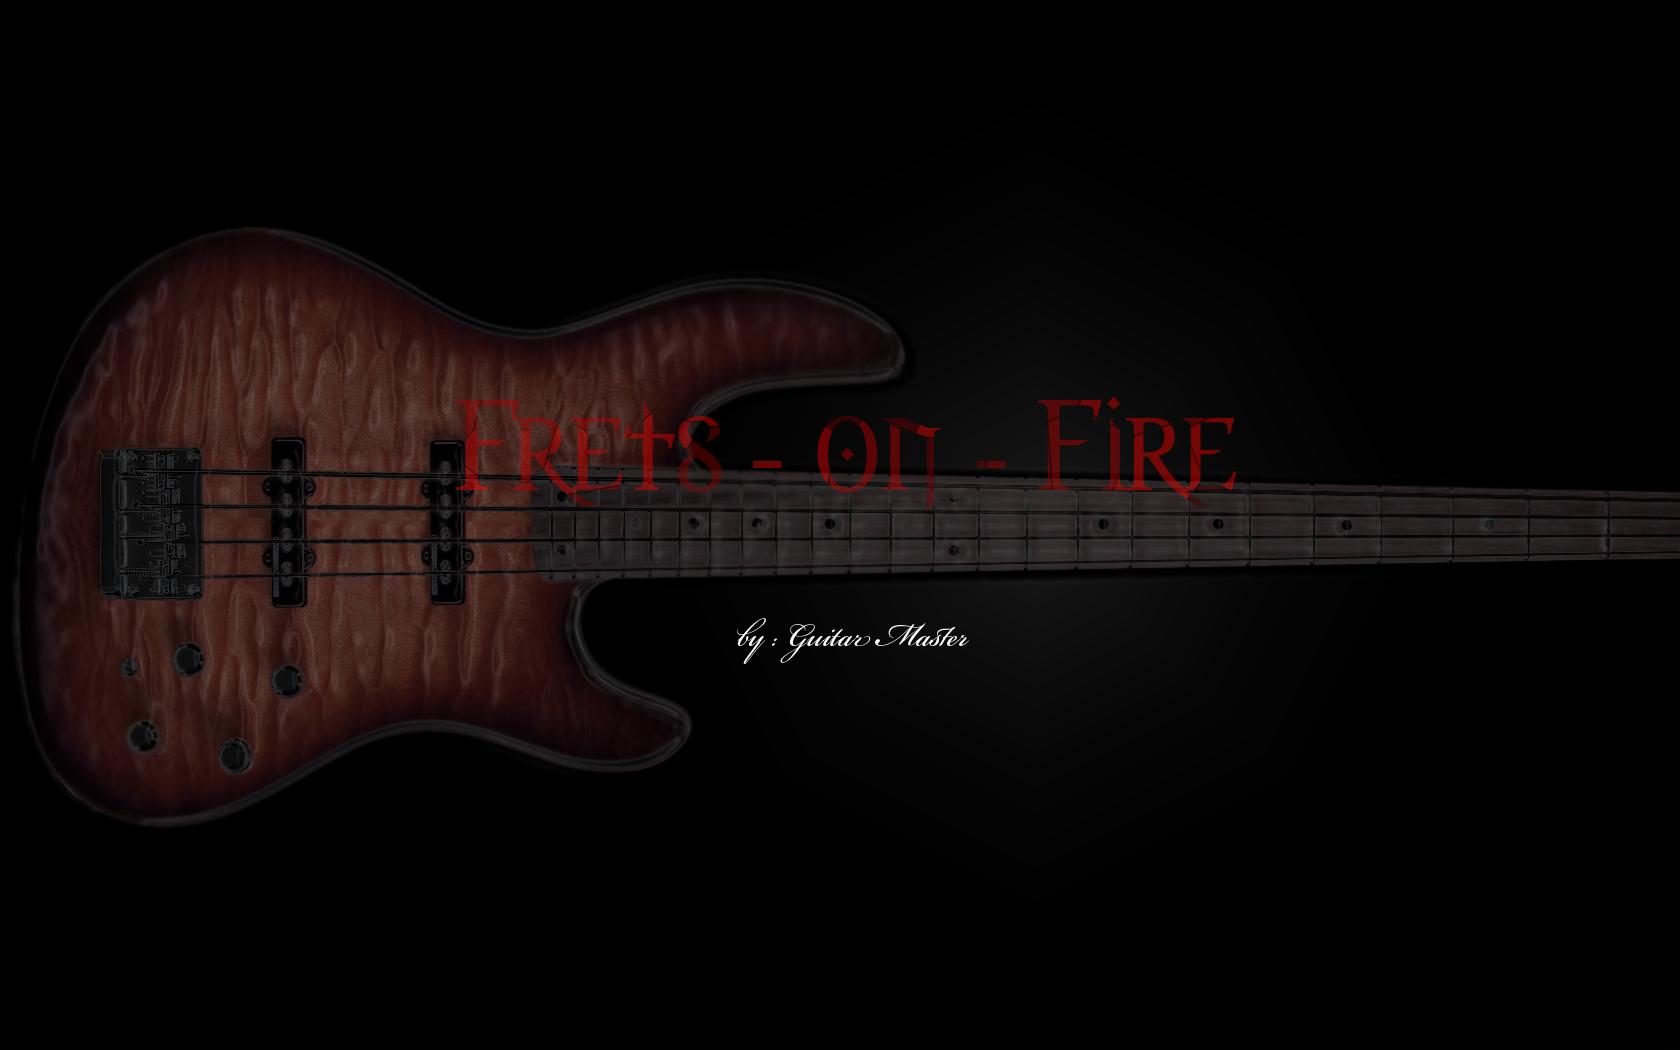 Frets on Fire Custom Wall by King-Aeolus